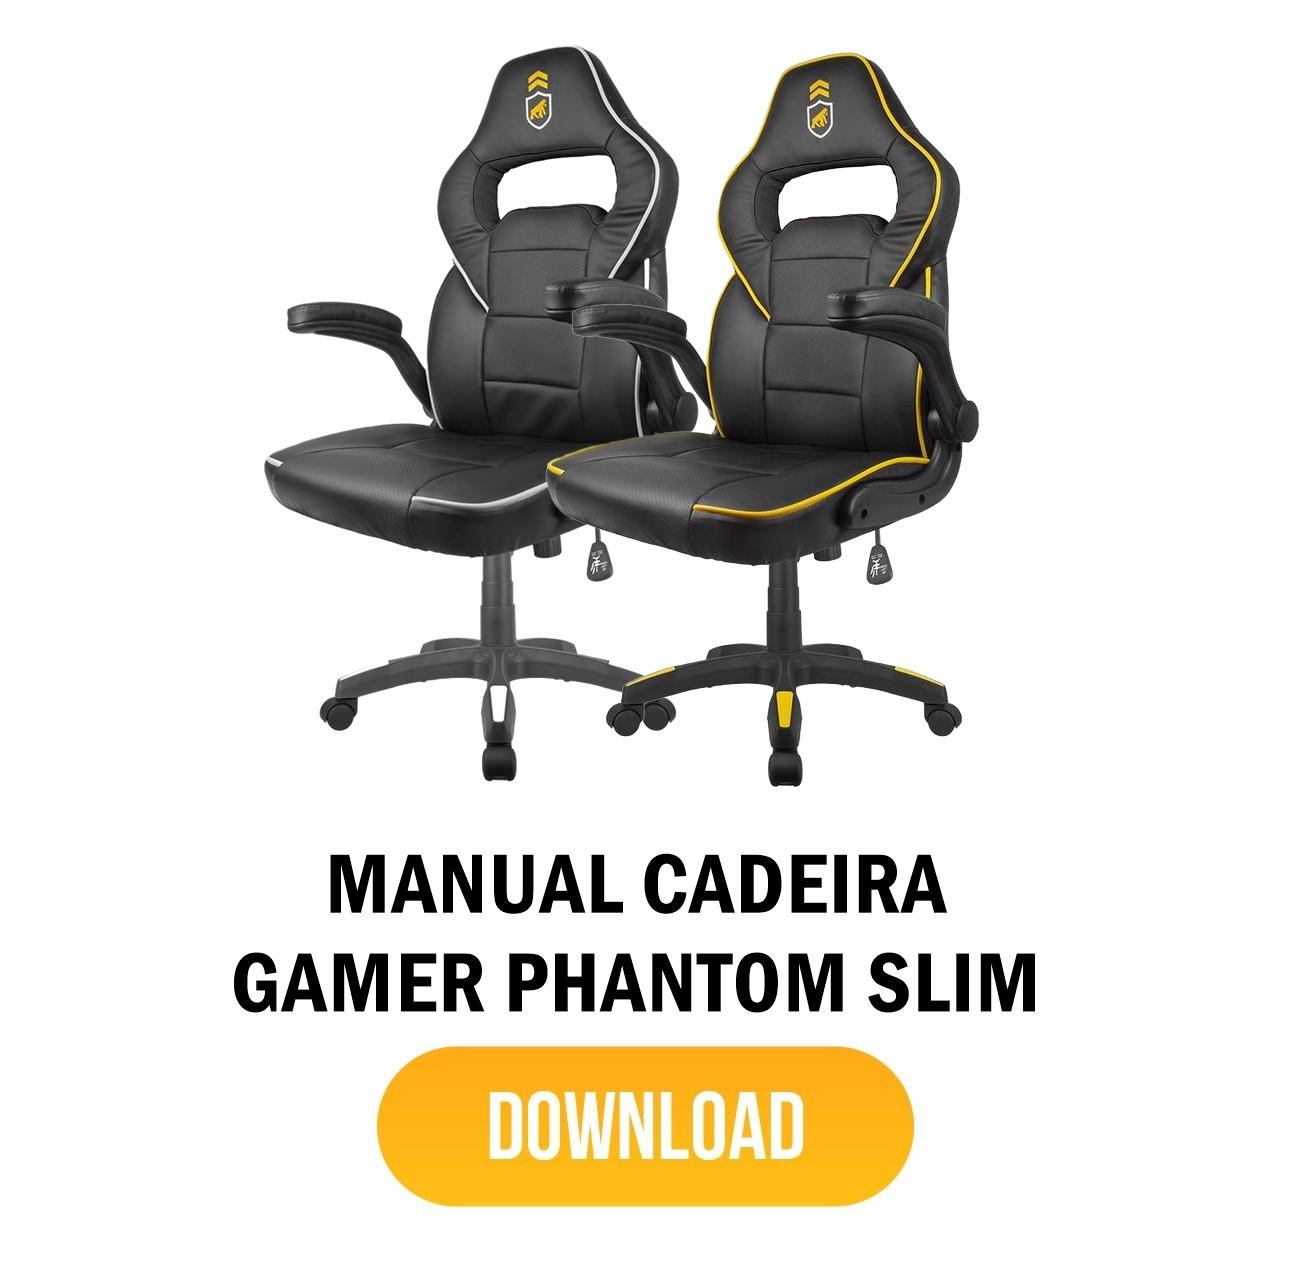 manual cadeira gamer armor - PHANTON SLIM